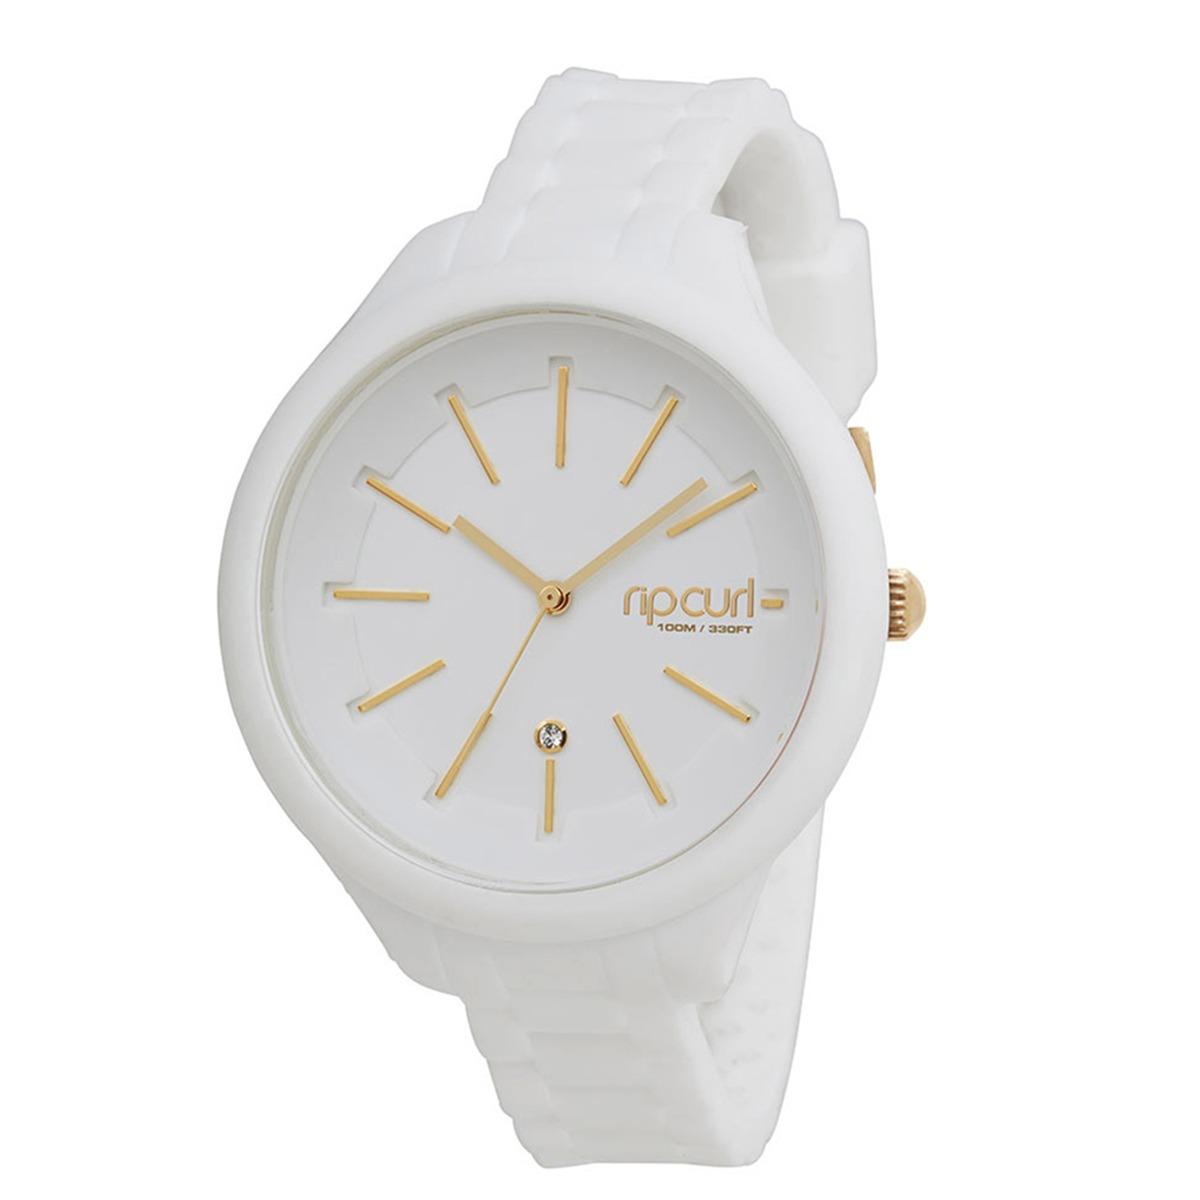 18d950a62ce relógio feminino rip curl alana horizon silicone branco. Carregando zoom.